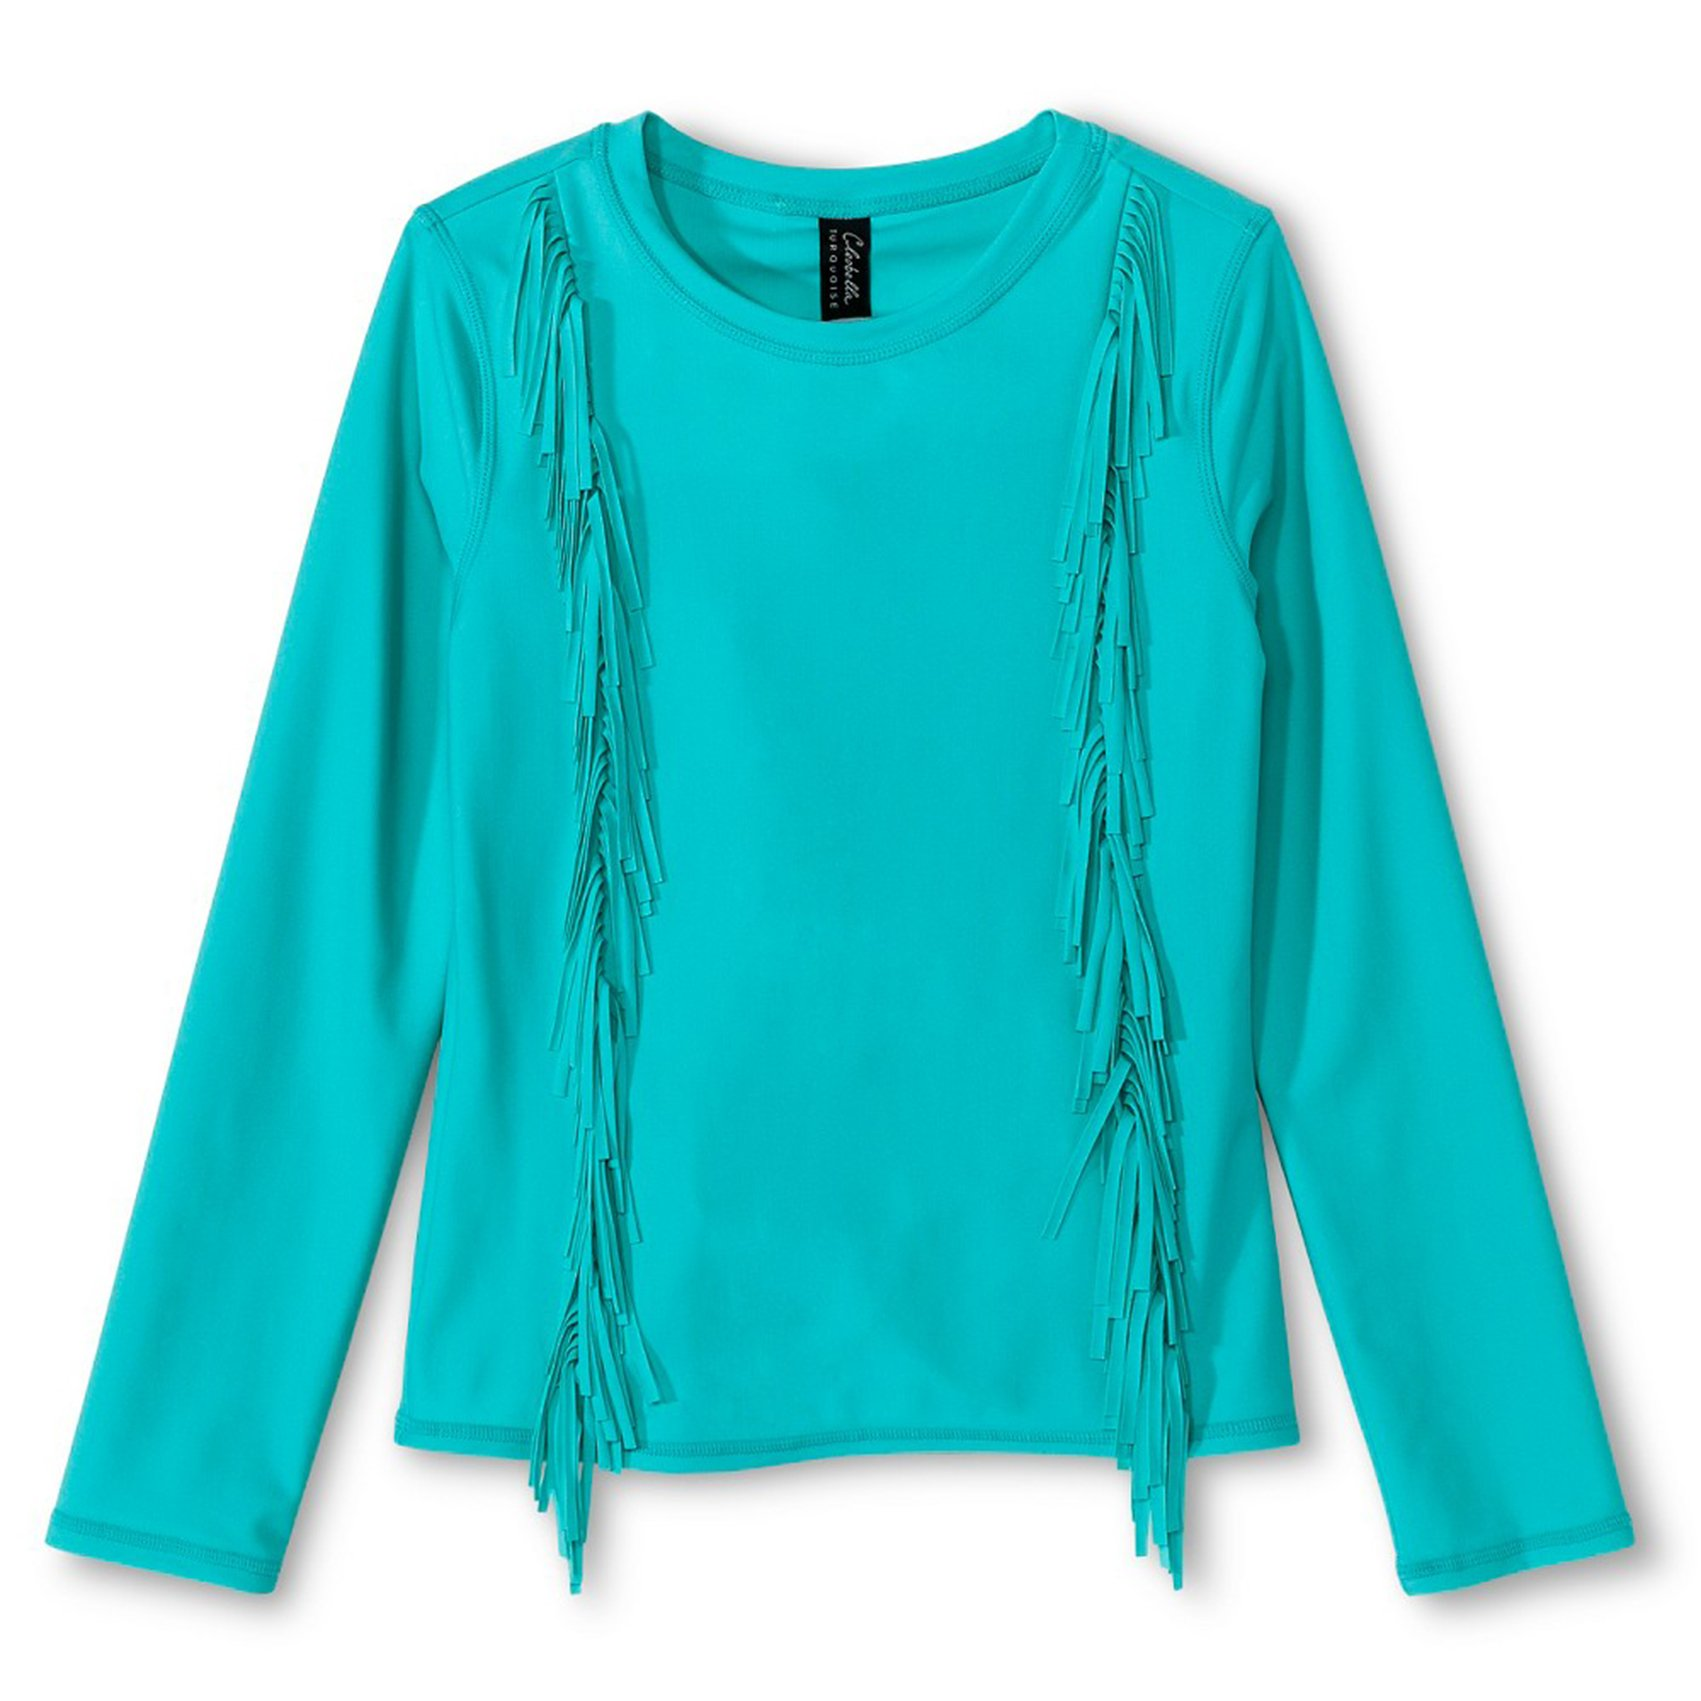 Cleobella Turquoise Wild Flower Girls' Long Sleeve Rash Guard (Medium, SEAGLASS)